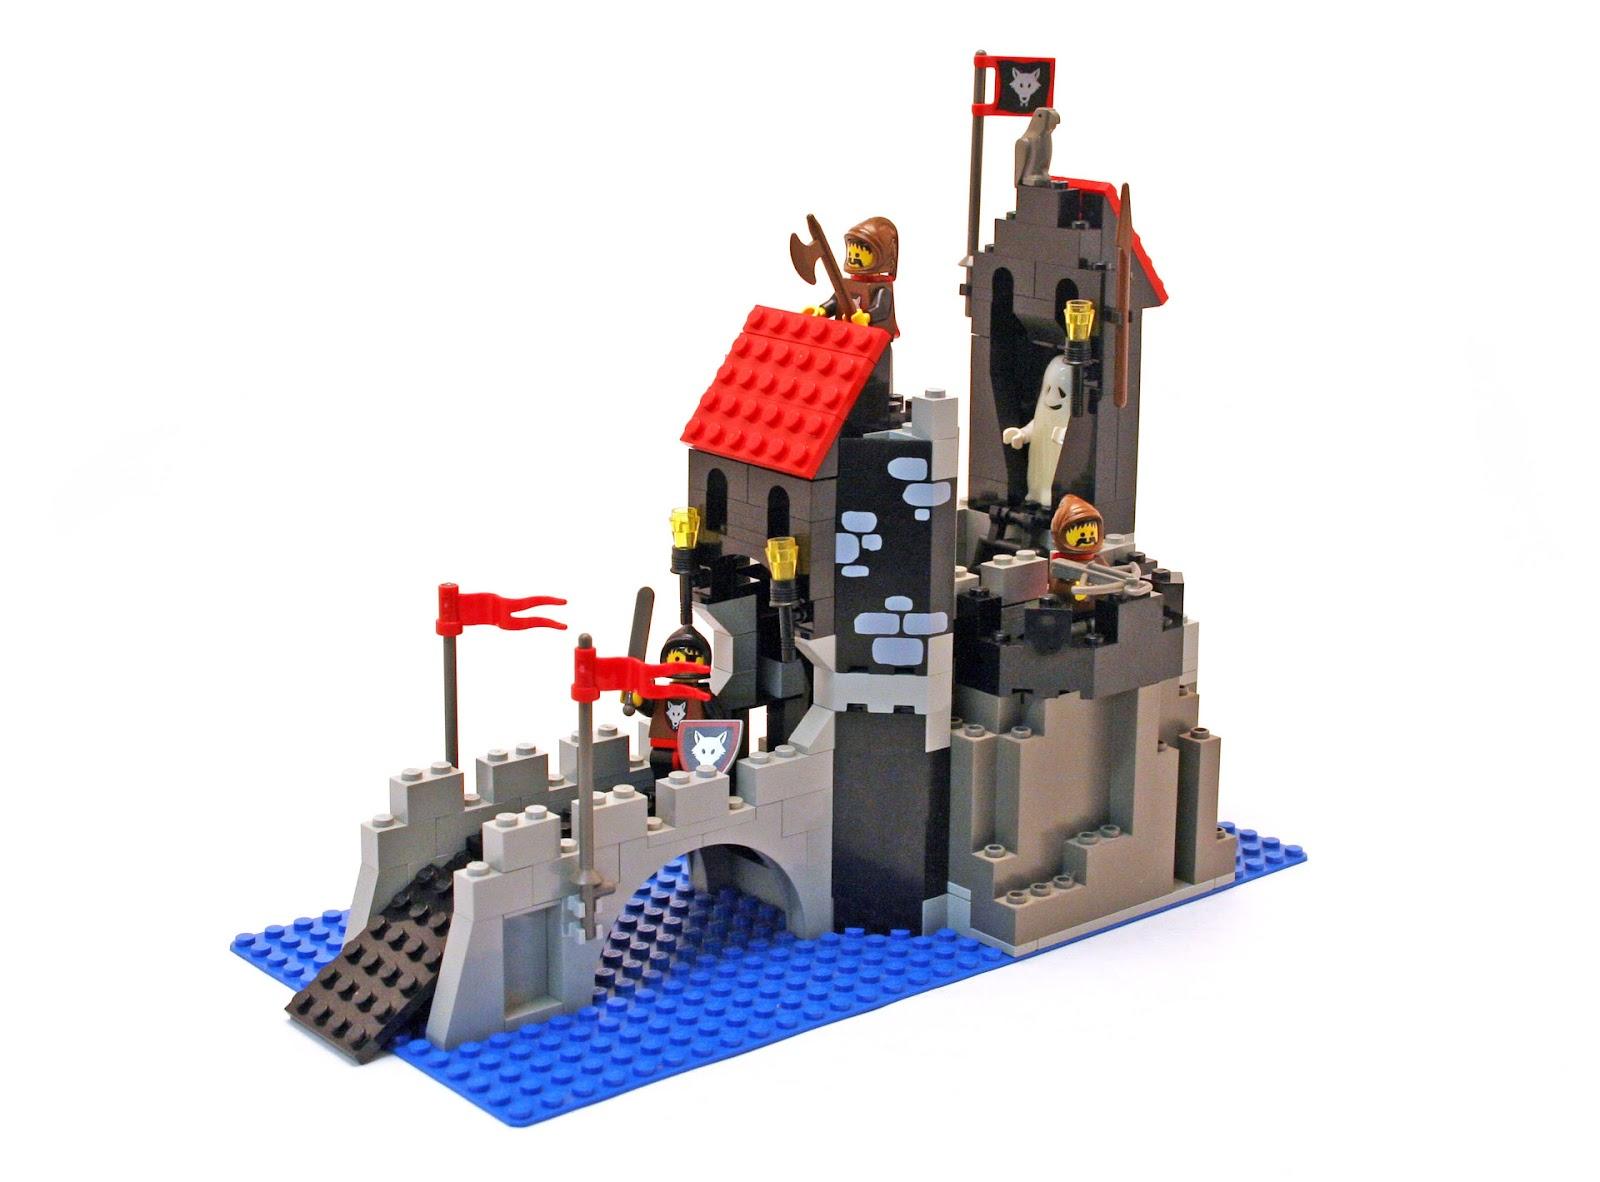 Wolfpack Tower - LEGO set #6075-1 (Building Sets > Castle > Wolfpack)